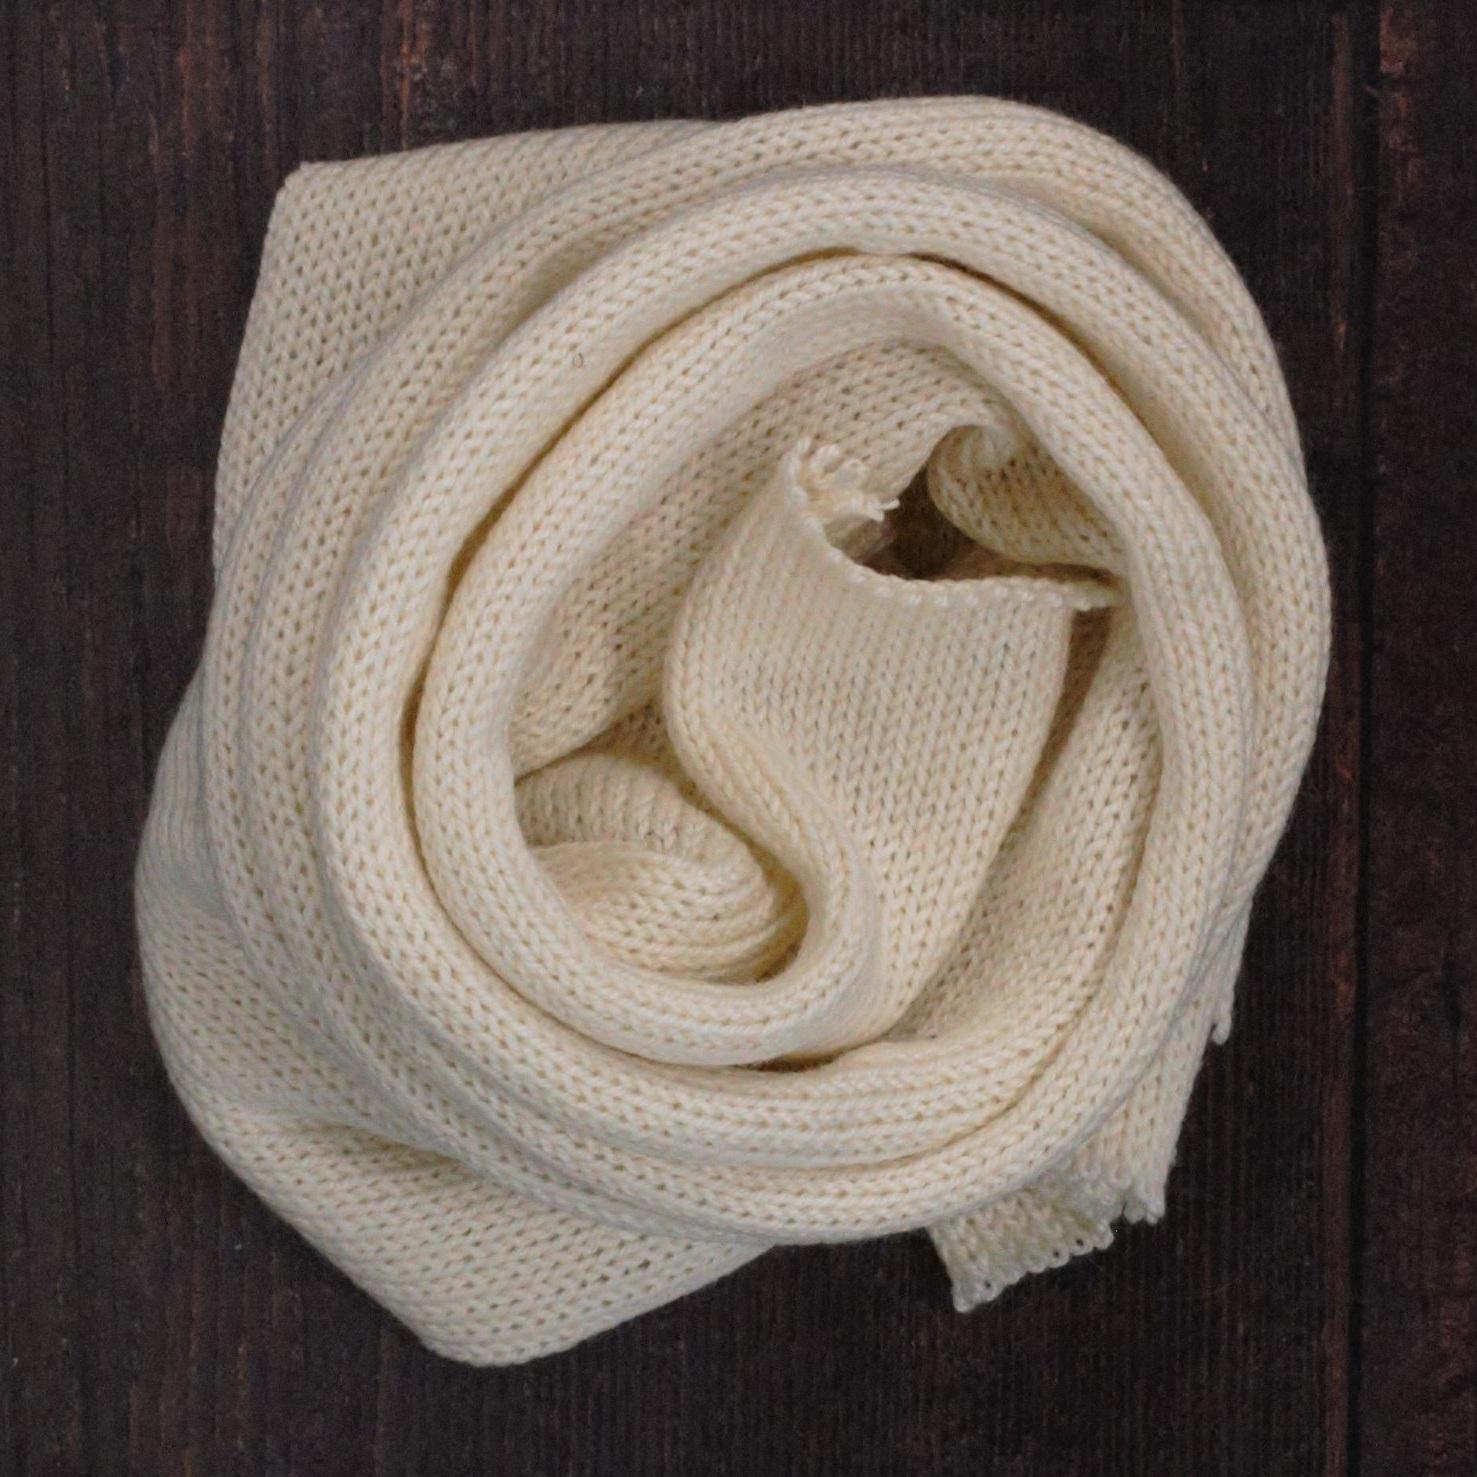 Type 49183  Diamond Sock Blank  80% Superwash Merino Wool 20% Silk  100g Sock Blank 400m per 100g 2/7.3nm